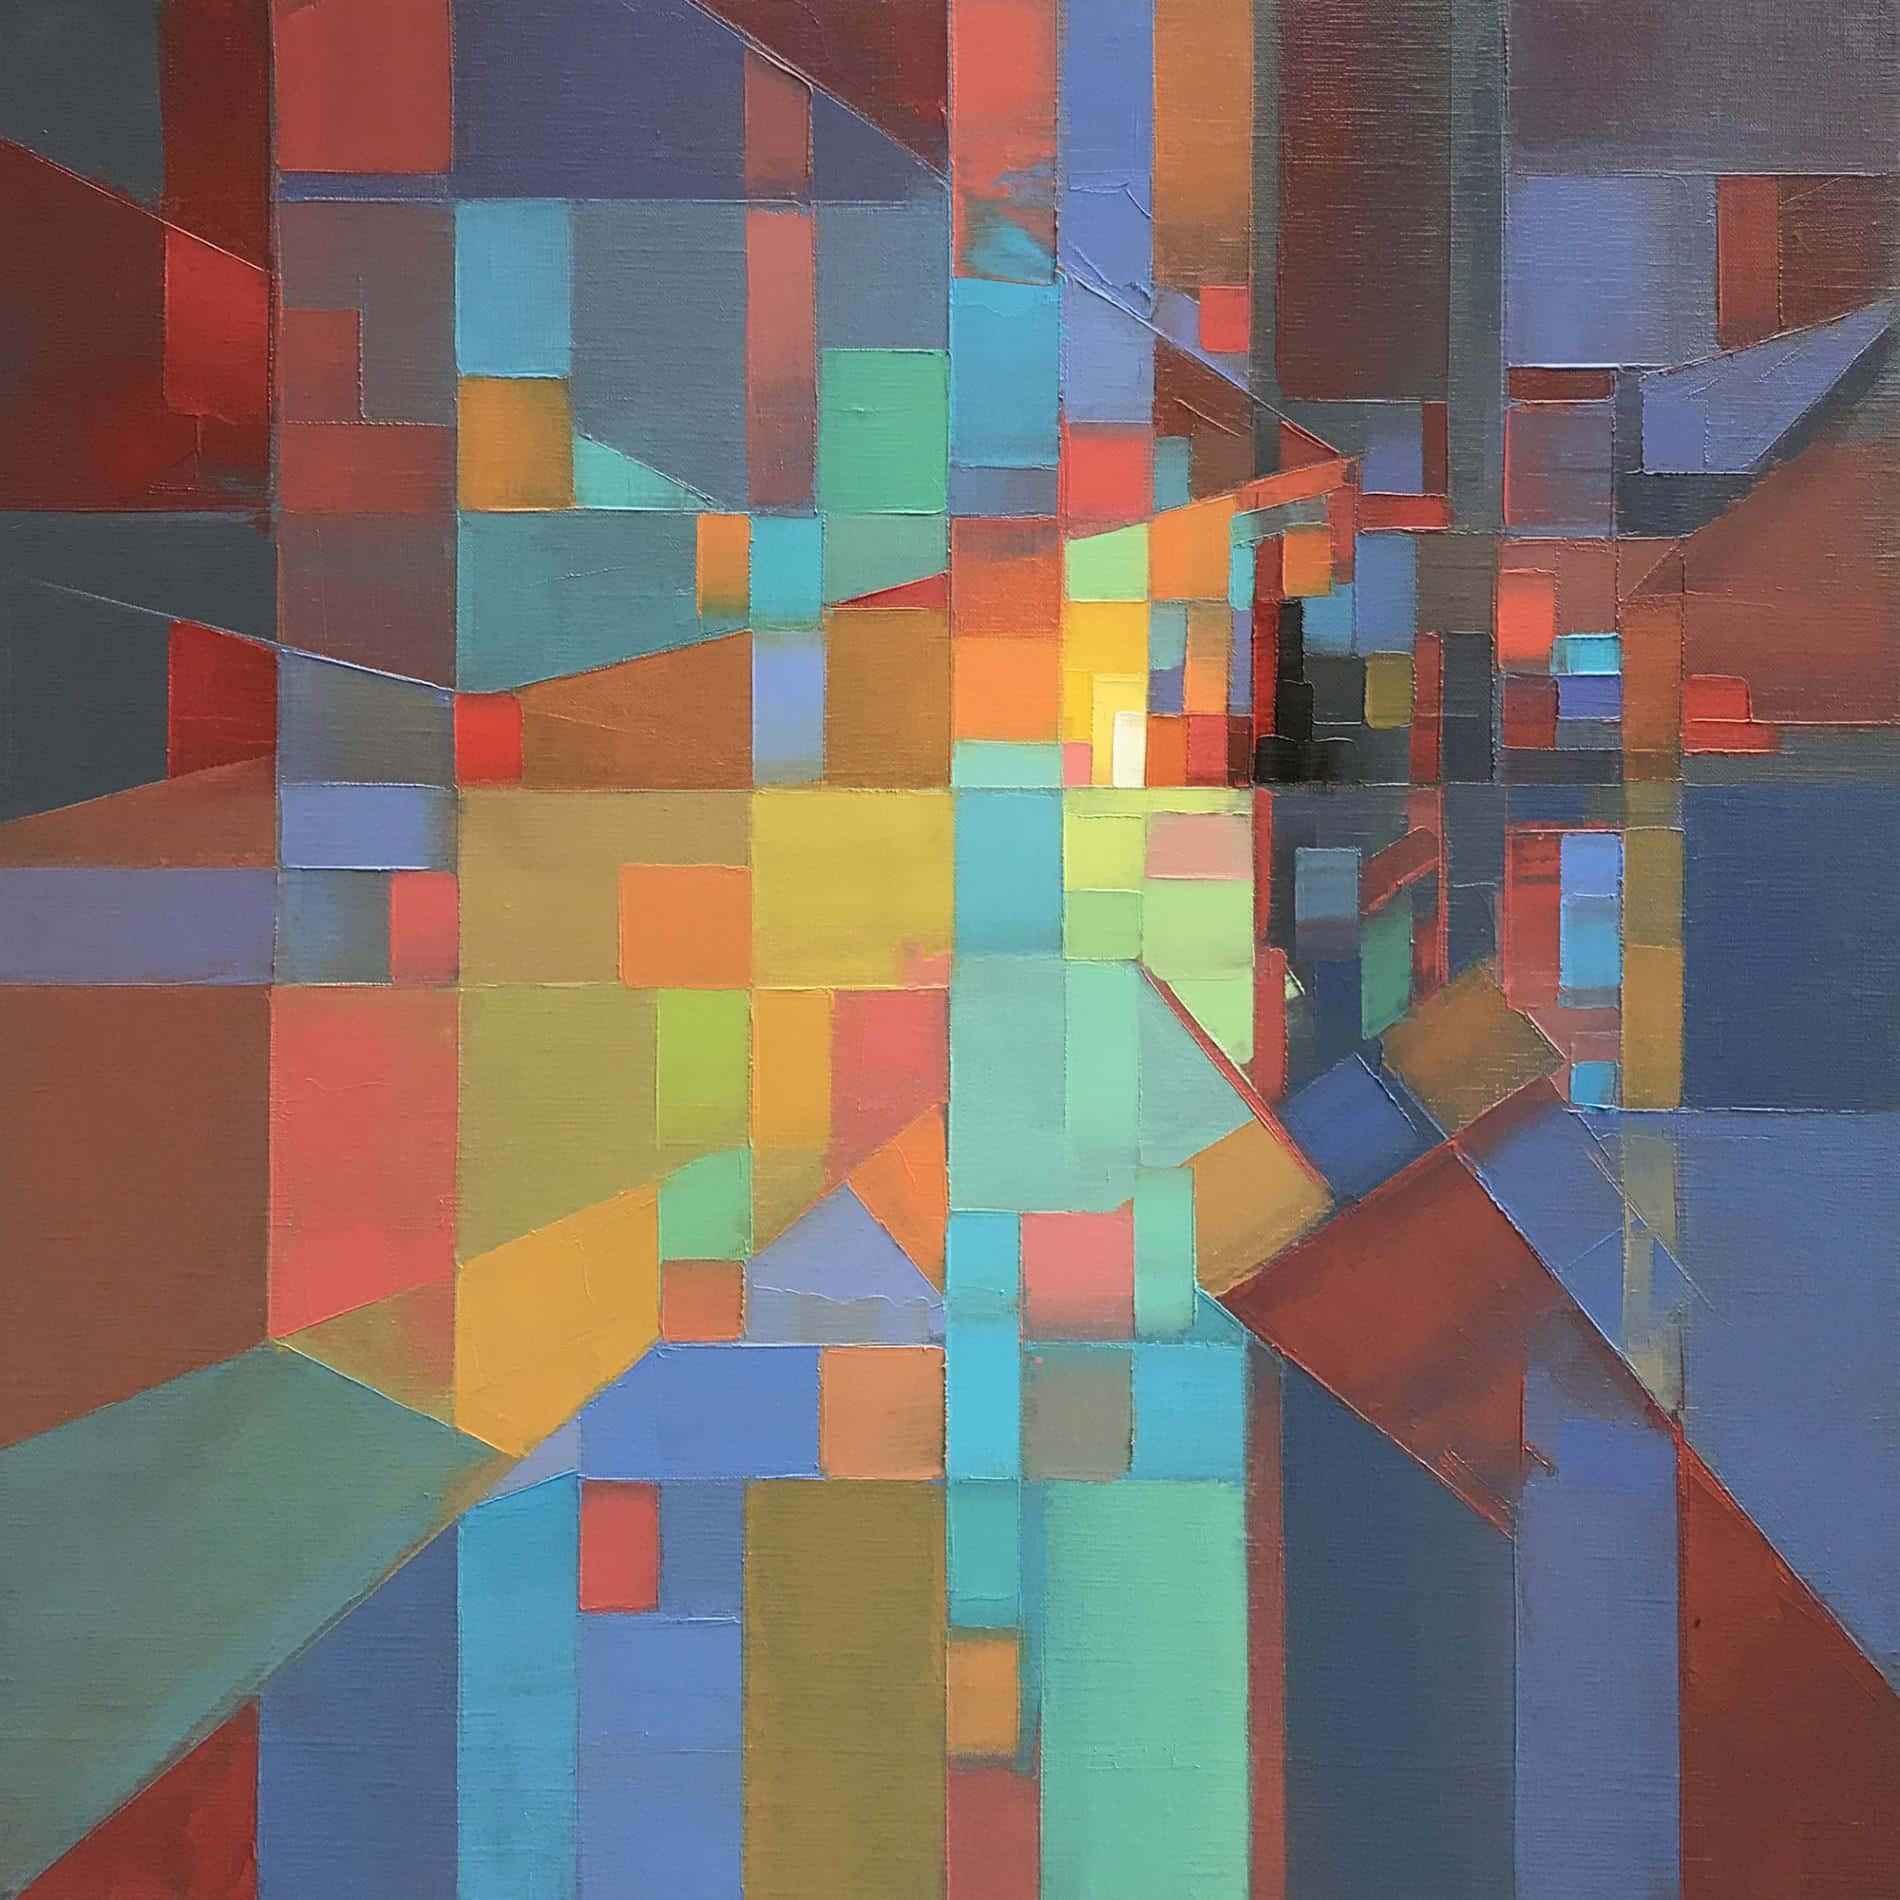 paisajes pixelados Jason Anderson plaid